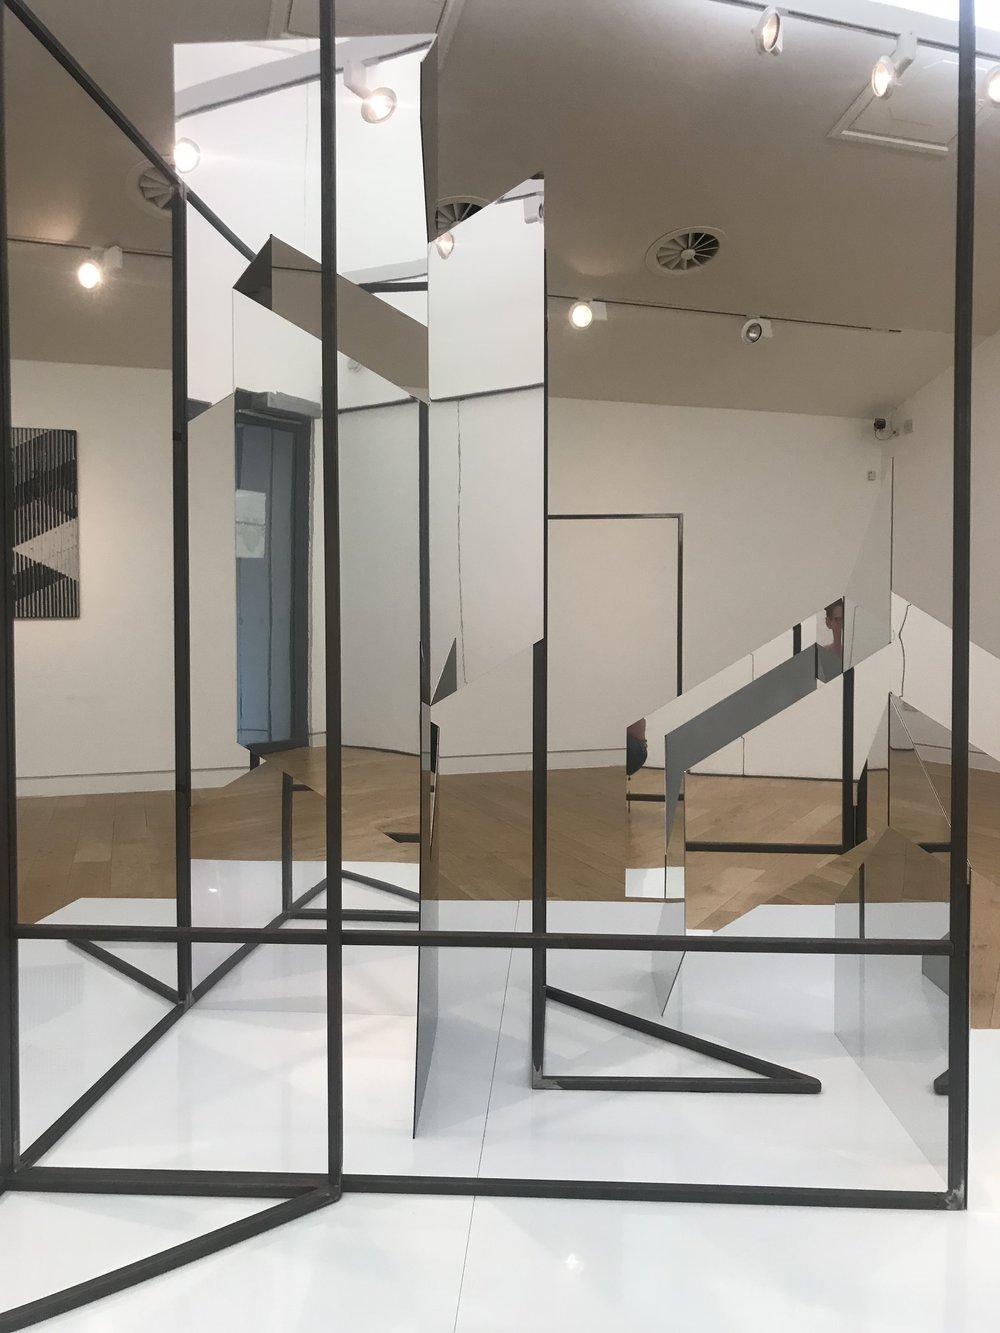 Border Controls. Rosalind Davis and Justin Hibbs Installation Shots at the Sevenoaks Kaleidoscope Gallery 2018. Photo 06-11-2018, 15 51 13.jpg